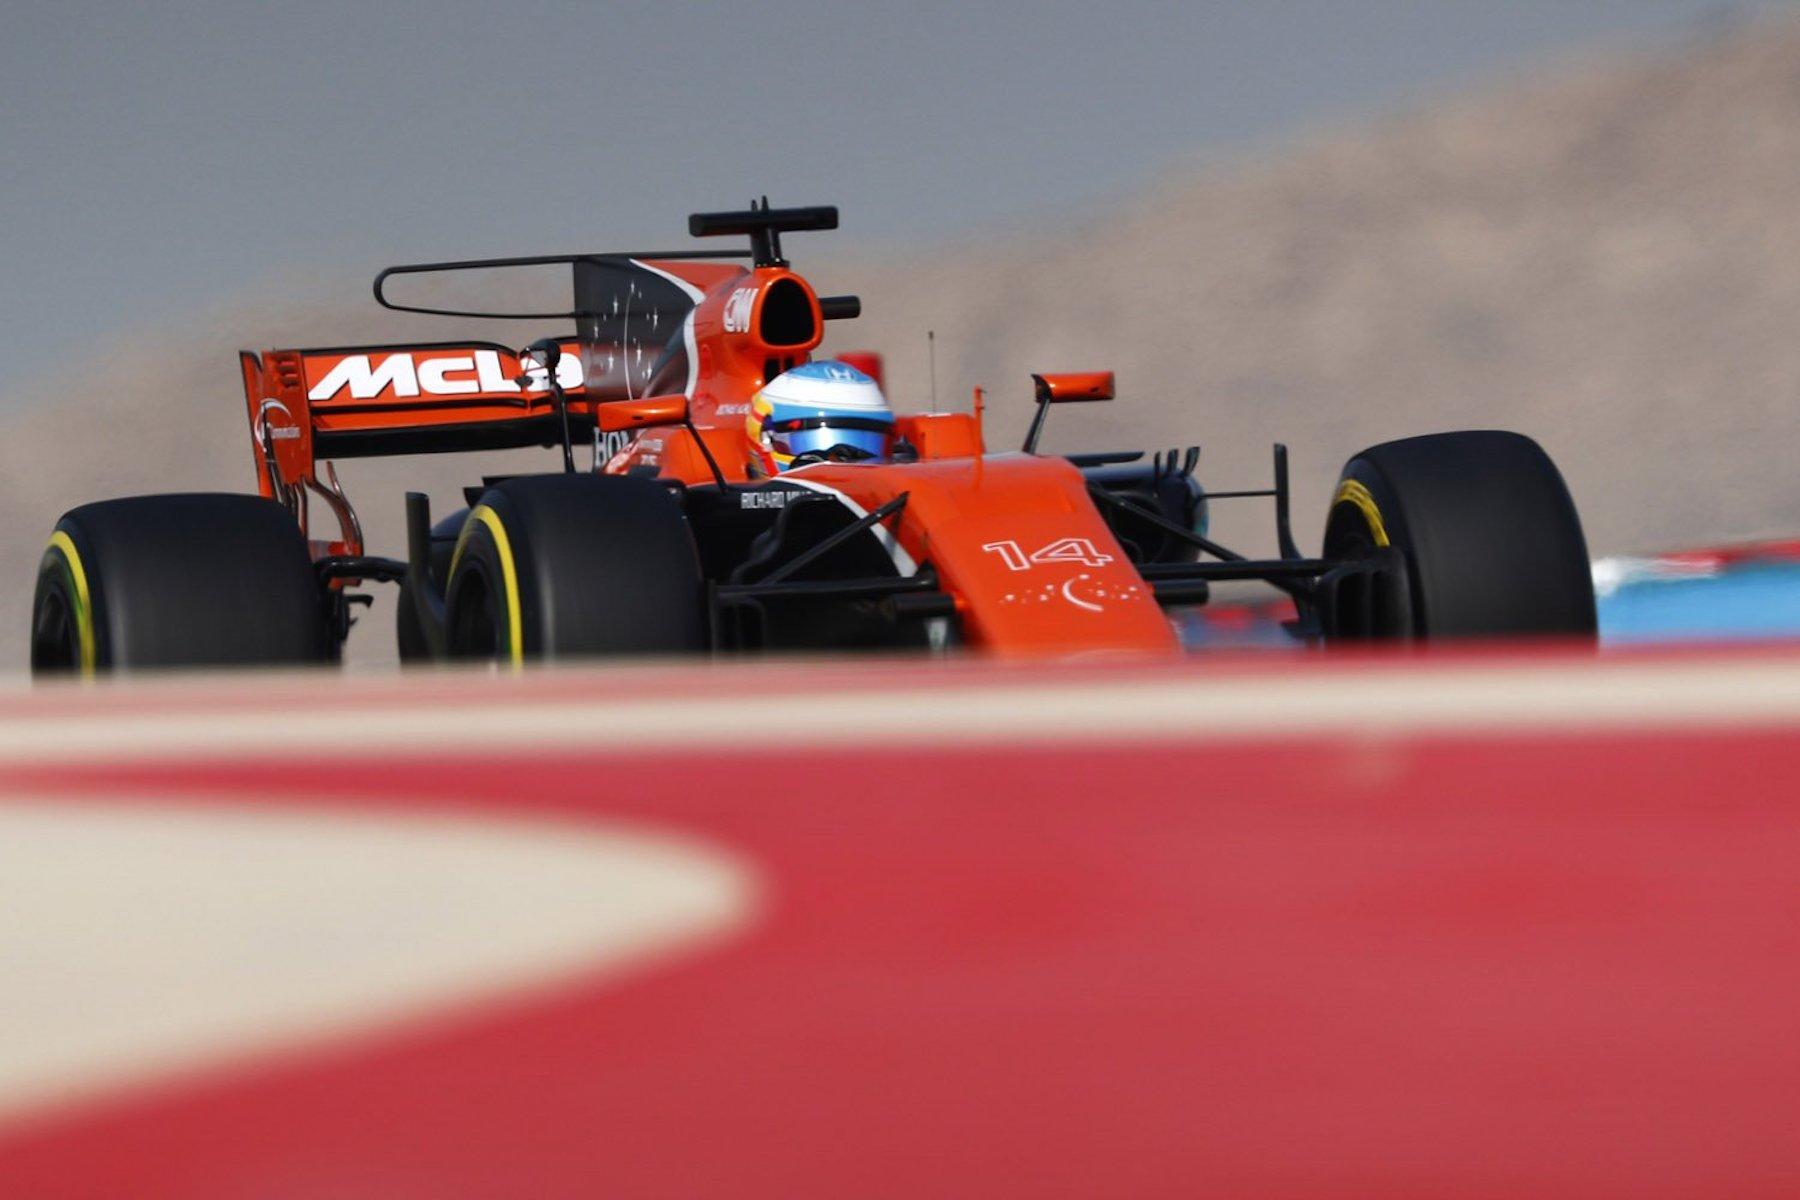 2017 Fernando Alonso   McLaren MCL32   2017 Bahrain GP FP3 1 copy.jpg